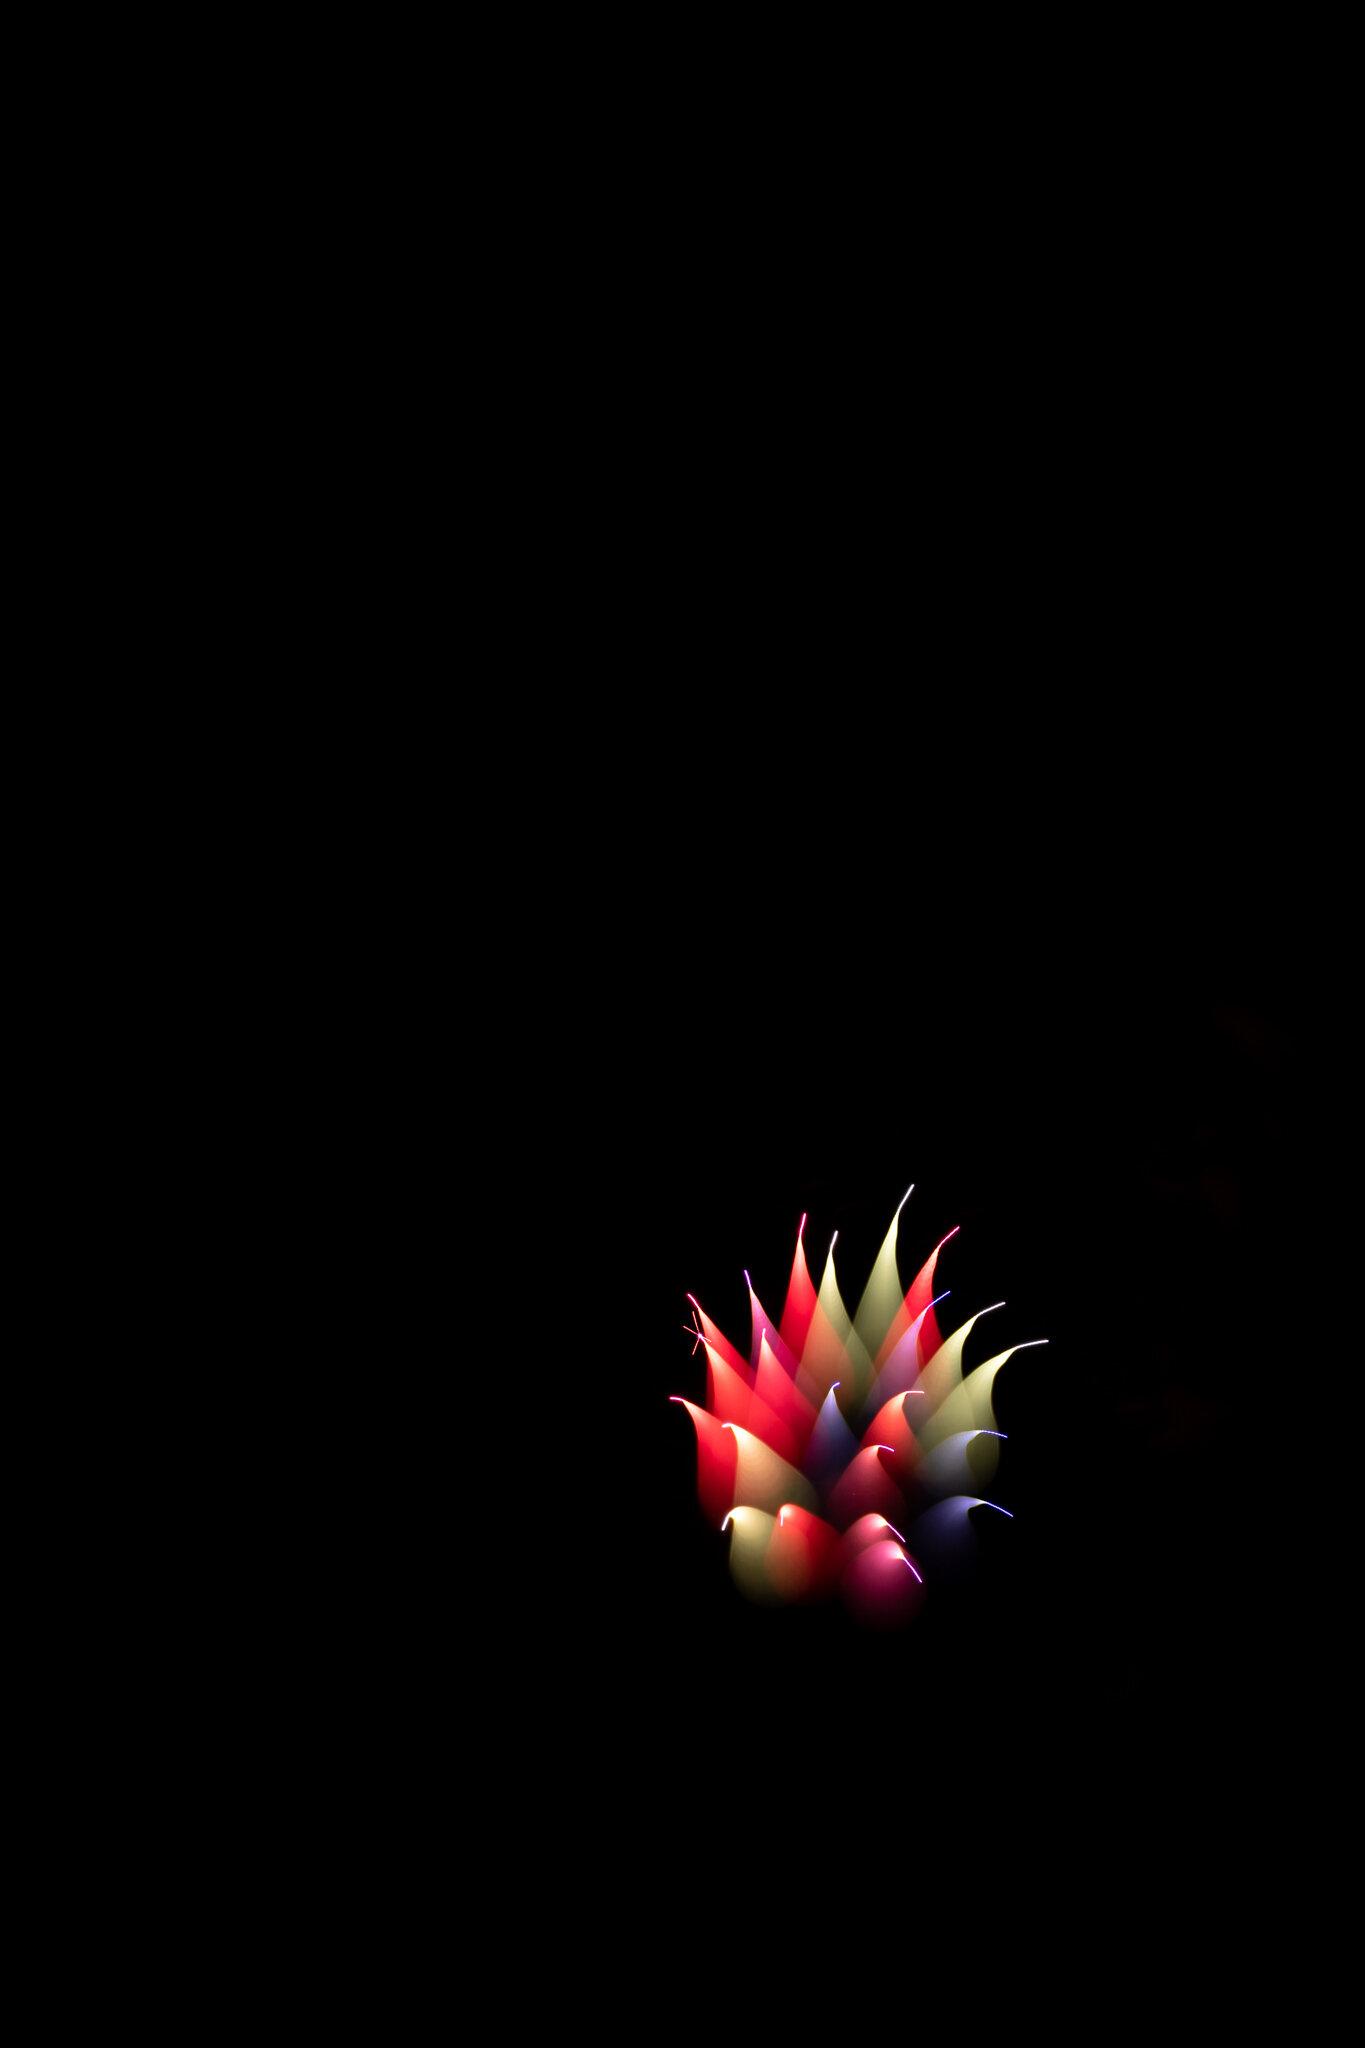 focuspulledfireworks-29.jpg